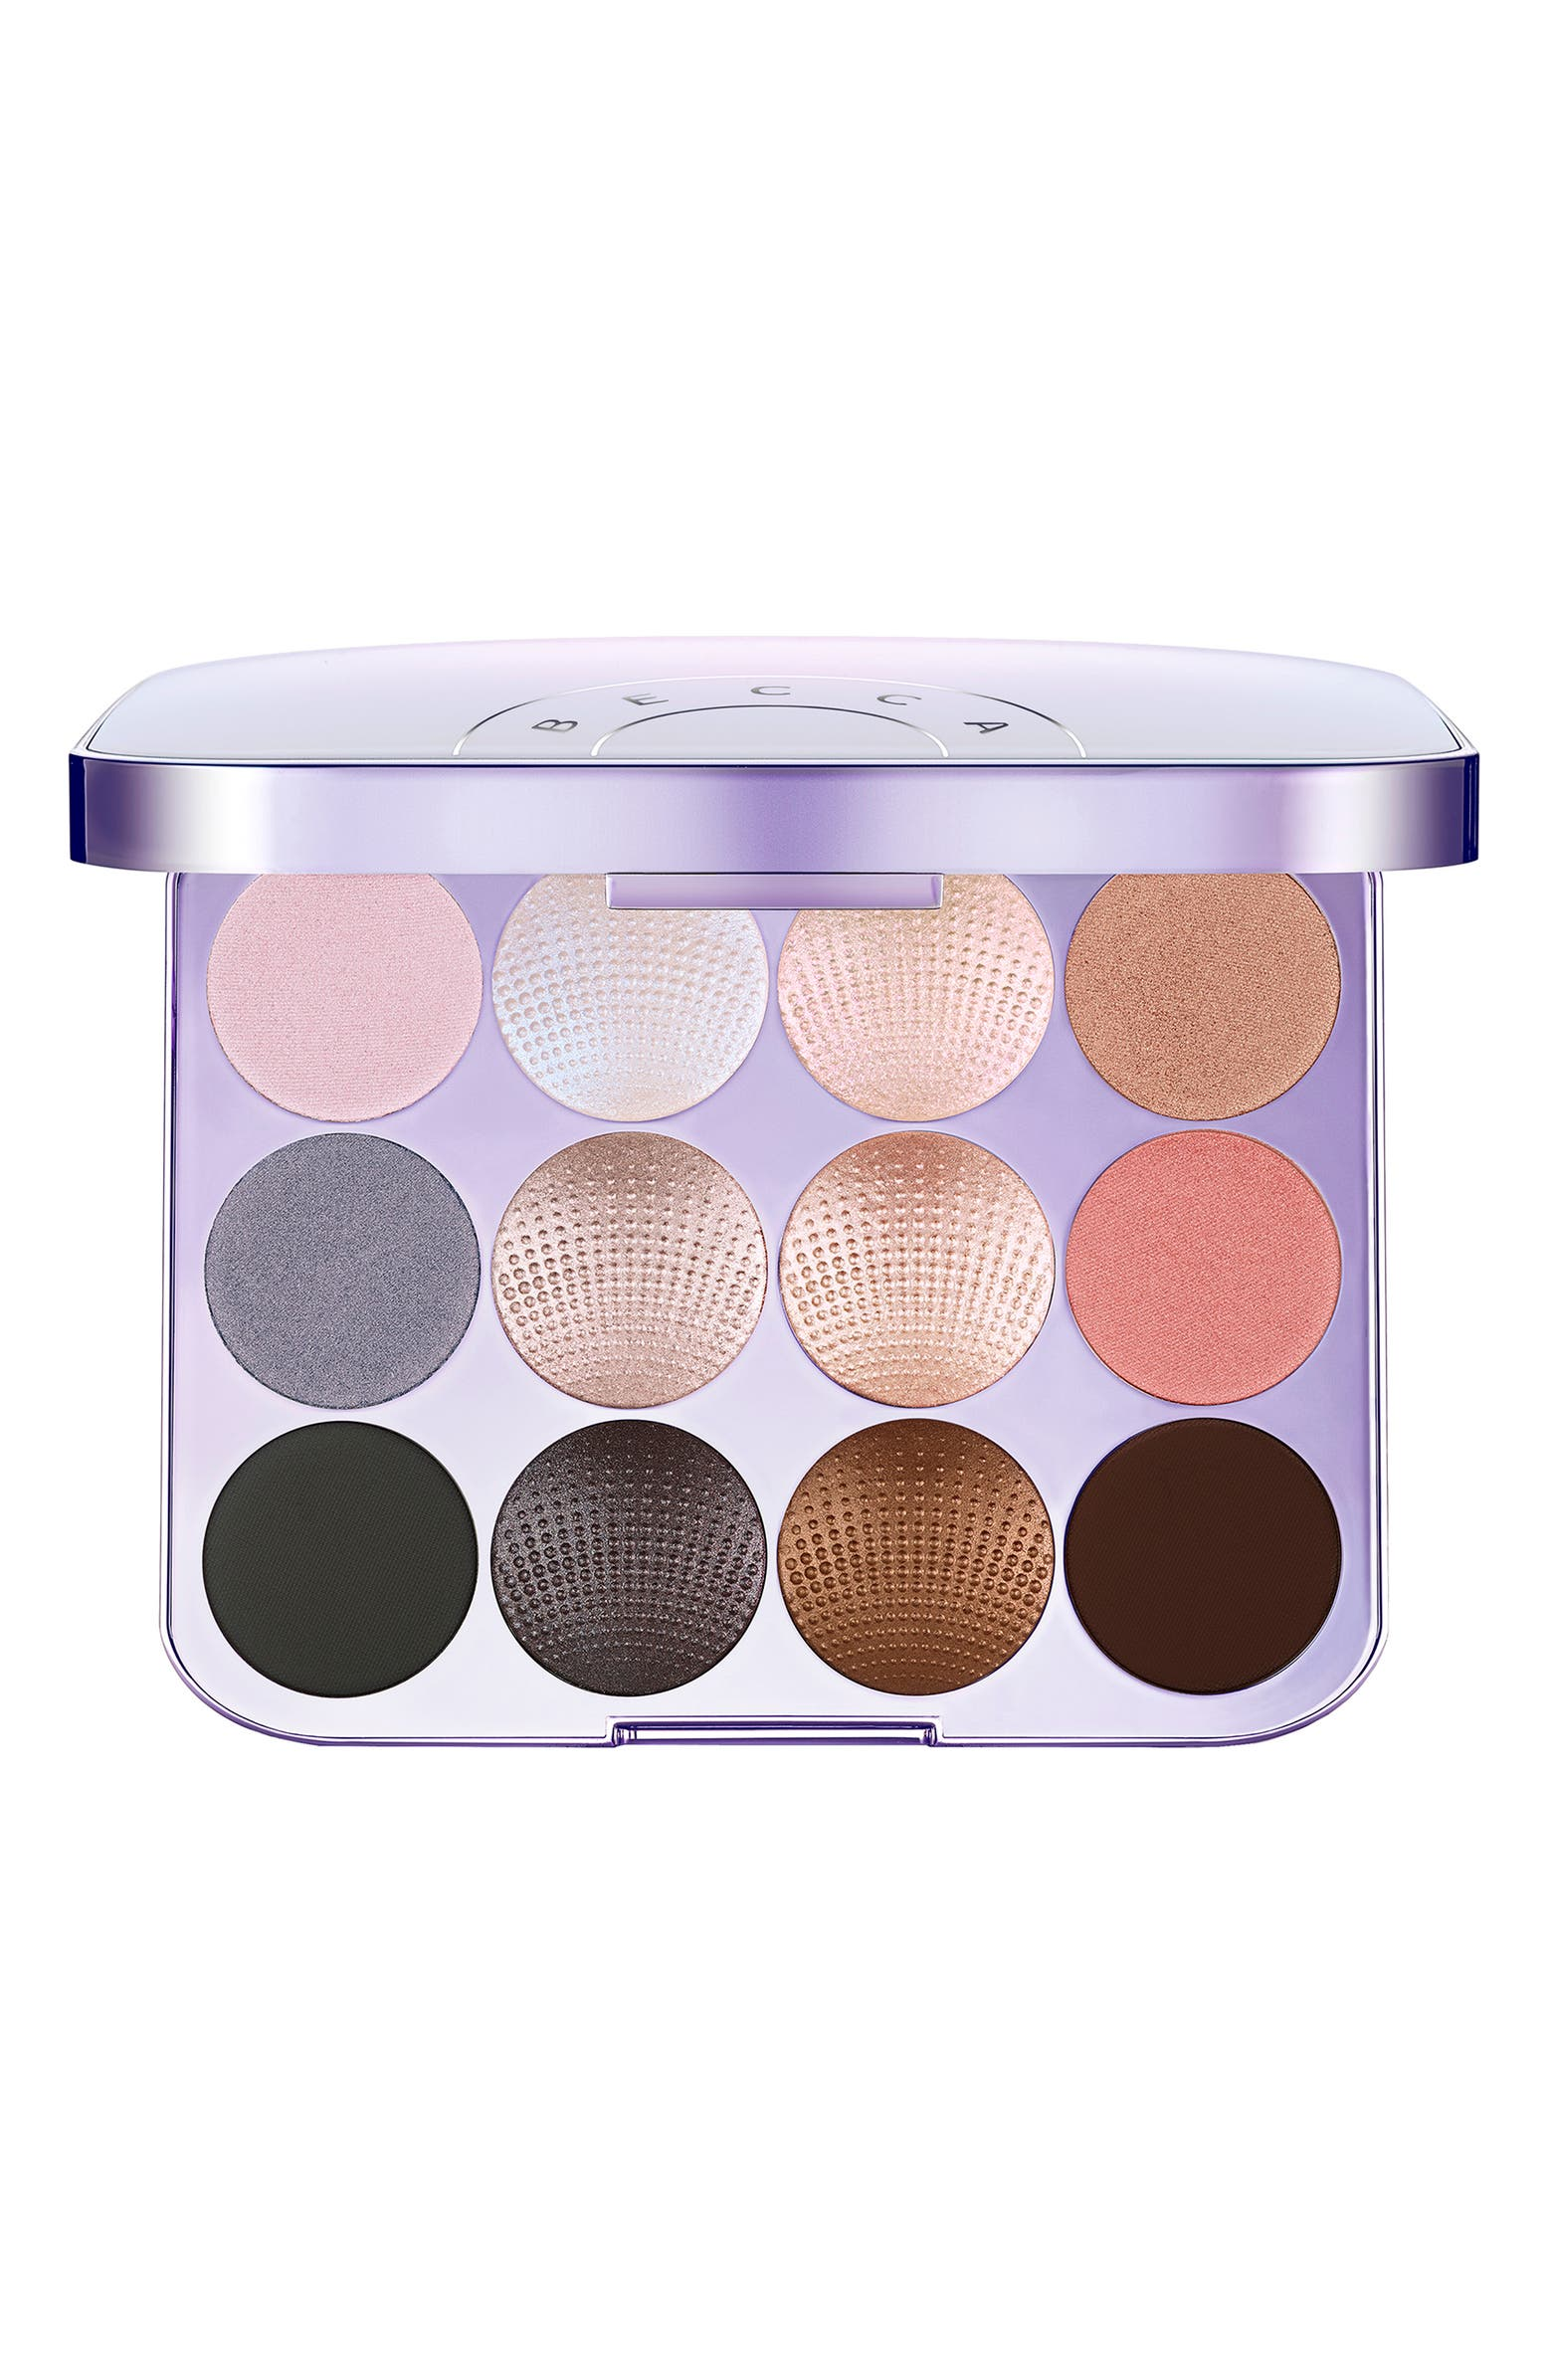 BECCA Pearl Glow Shimmering Eyeshadow Palette BECCA COSMETICS